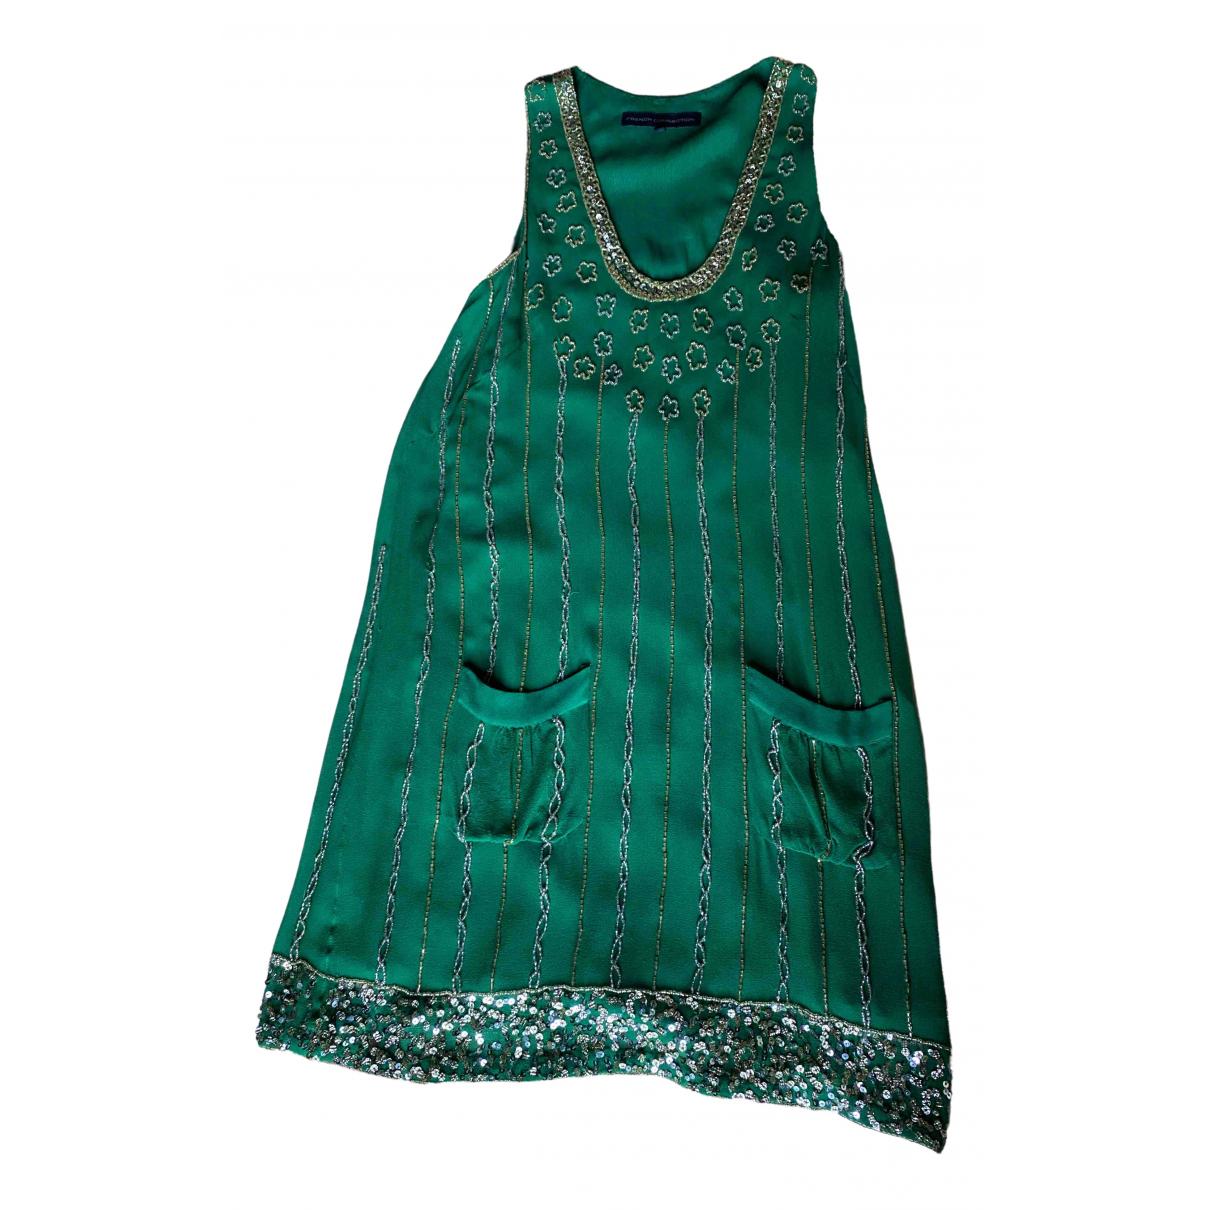 French Connection \N Green Glitter dress for Women 8 UK